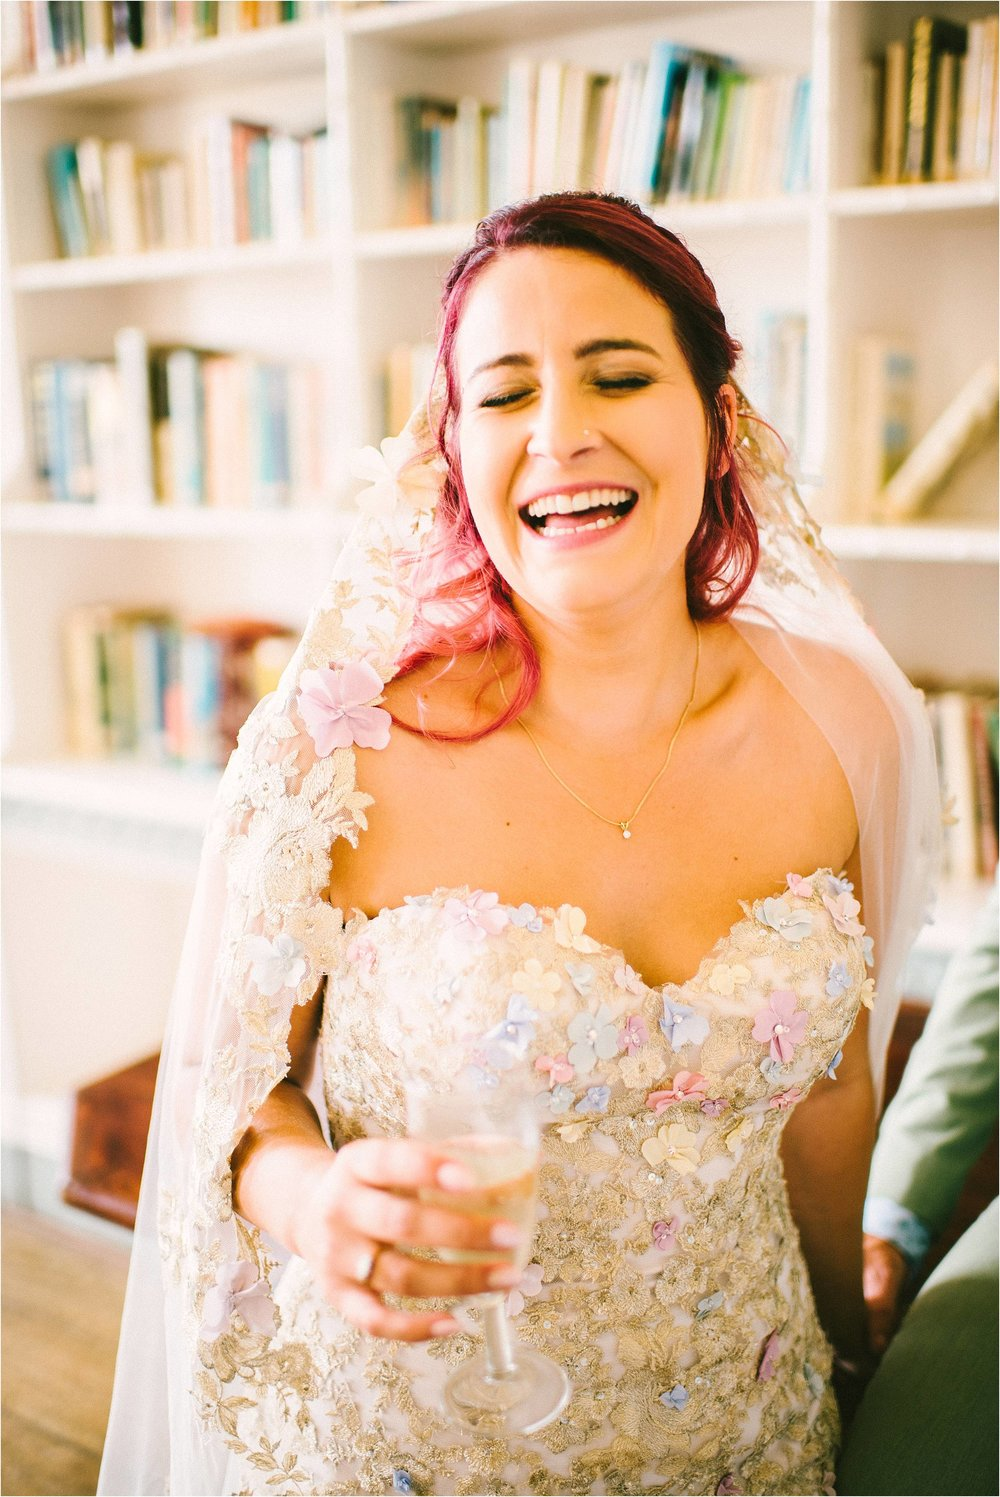 Milton Abbey Dorset Wedding Photographer_0101.jpg